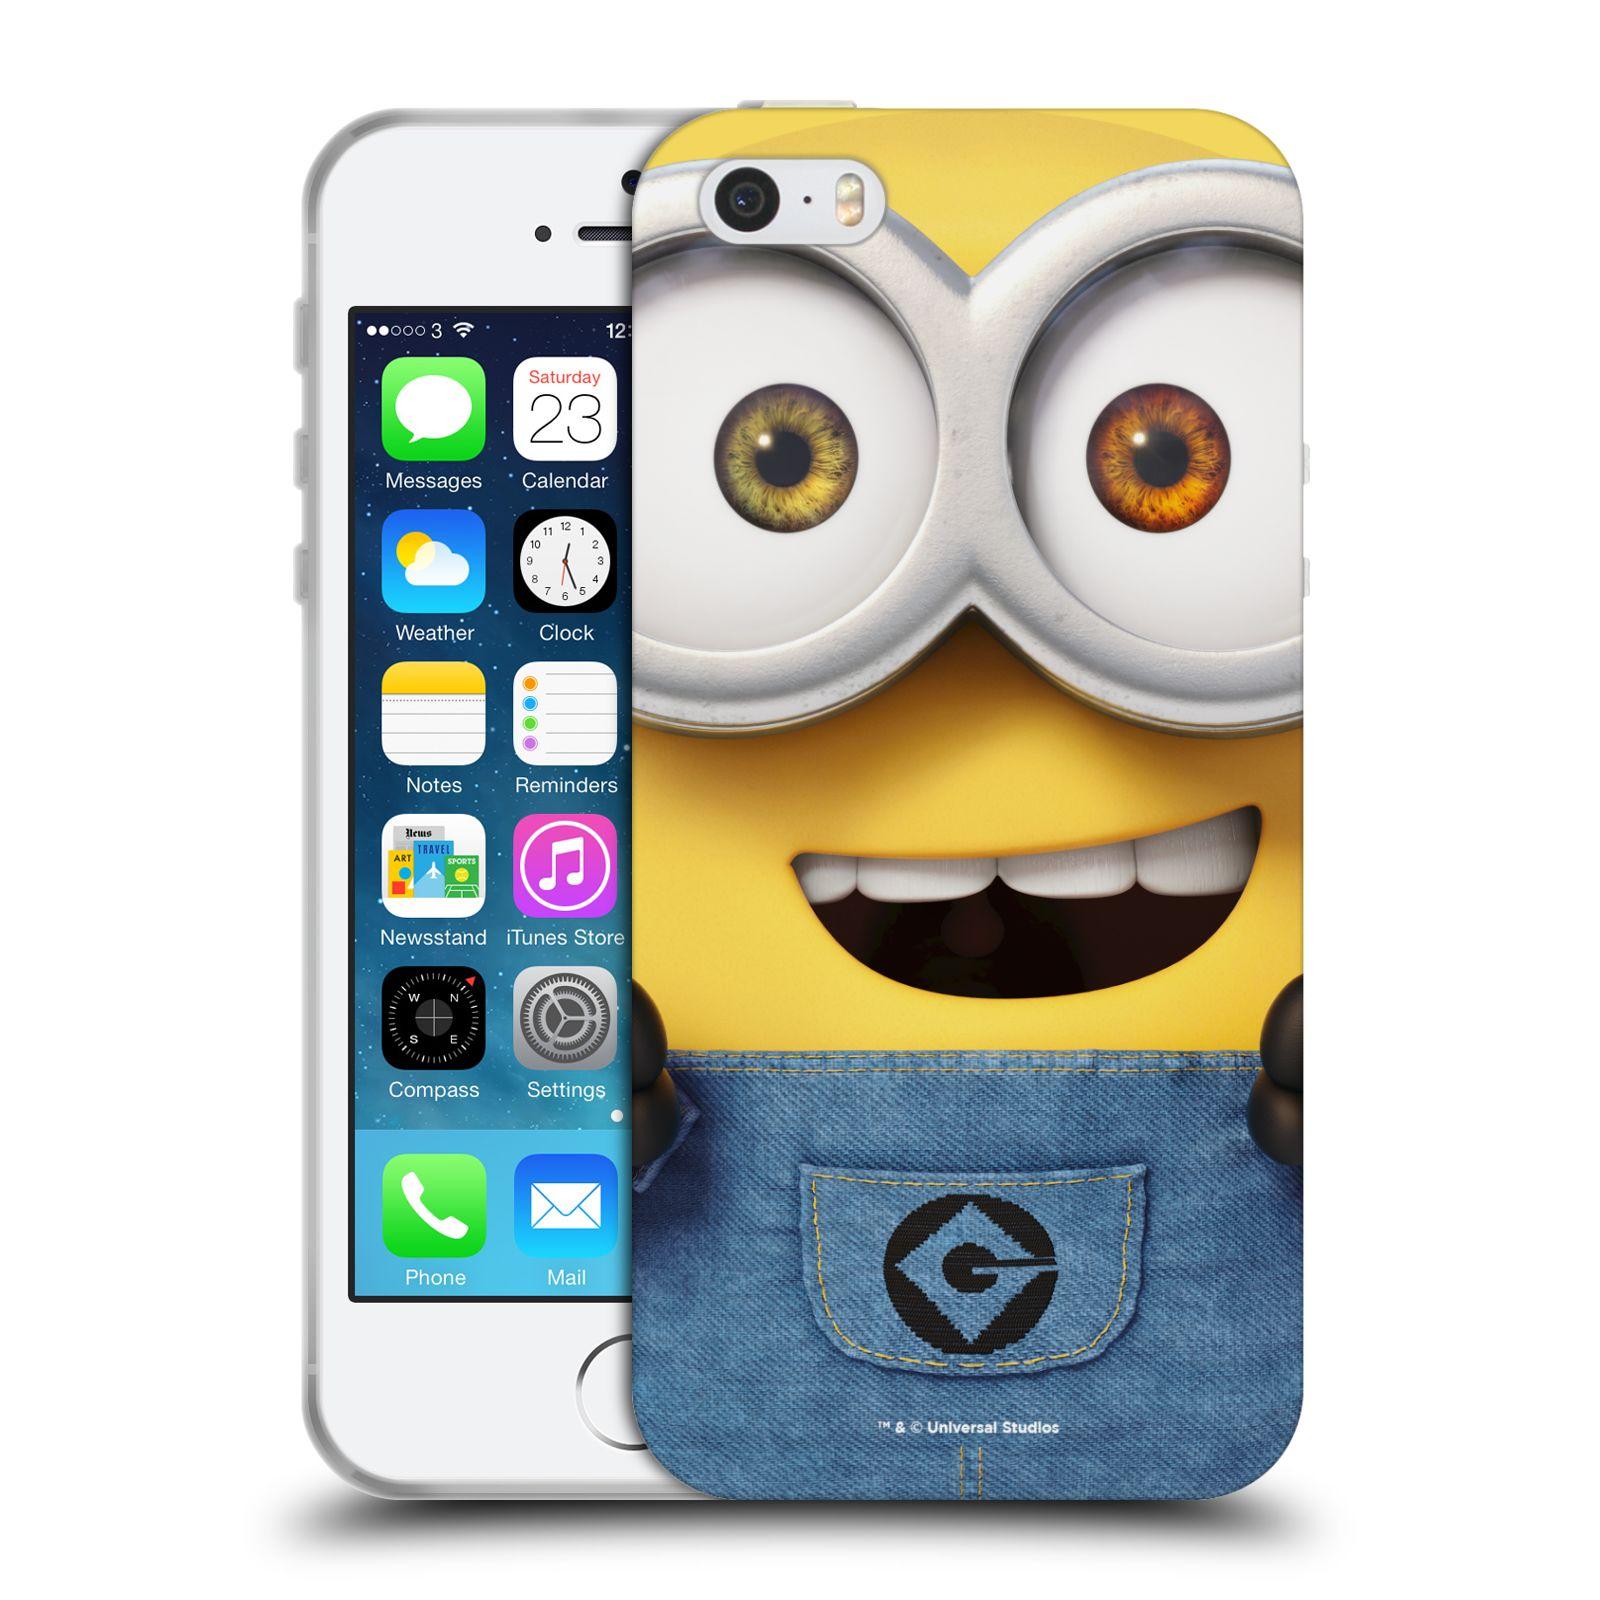 Silikonové pouzdro na mobil Apple iPhone 5, 5S, SE - Head Case - Mimoň Bob z filmu Já, padouch - Despicable Me